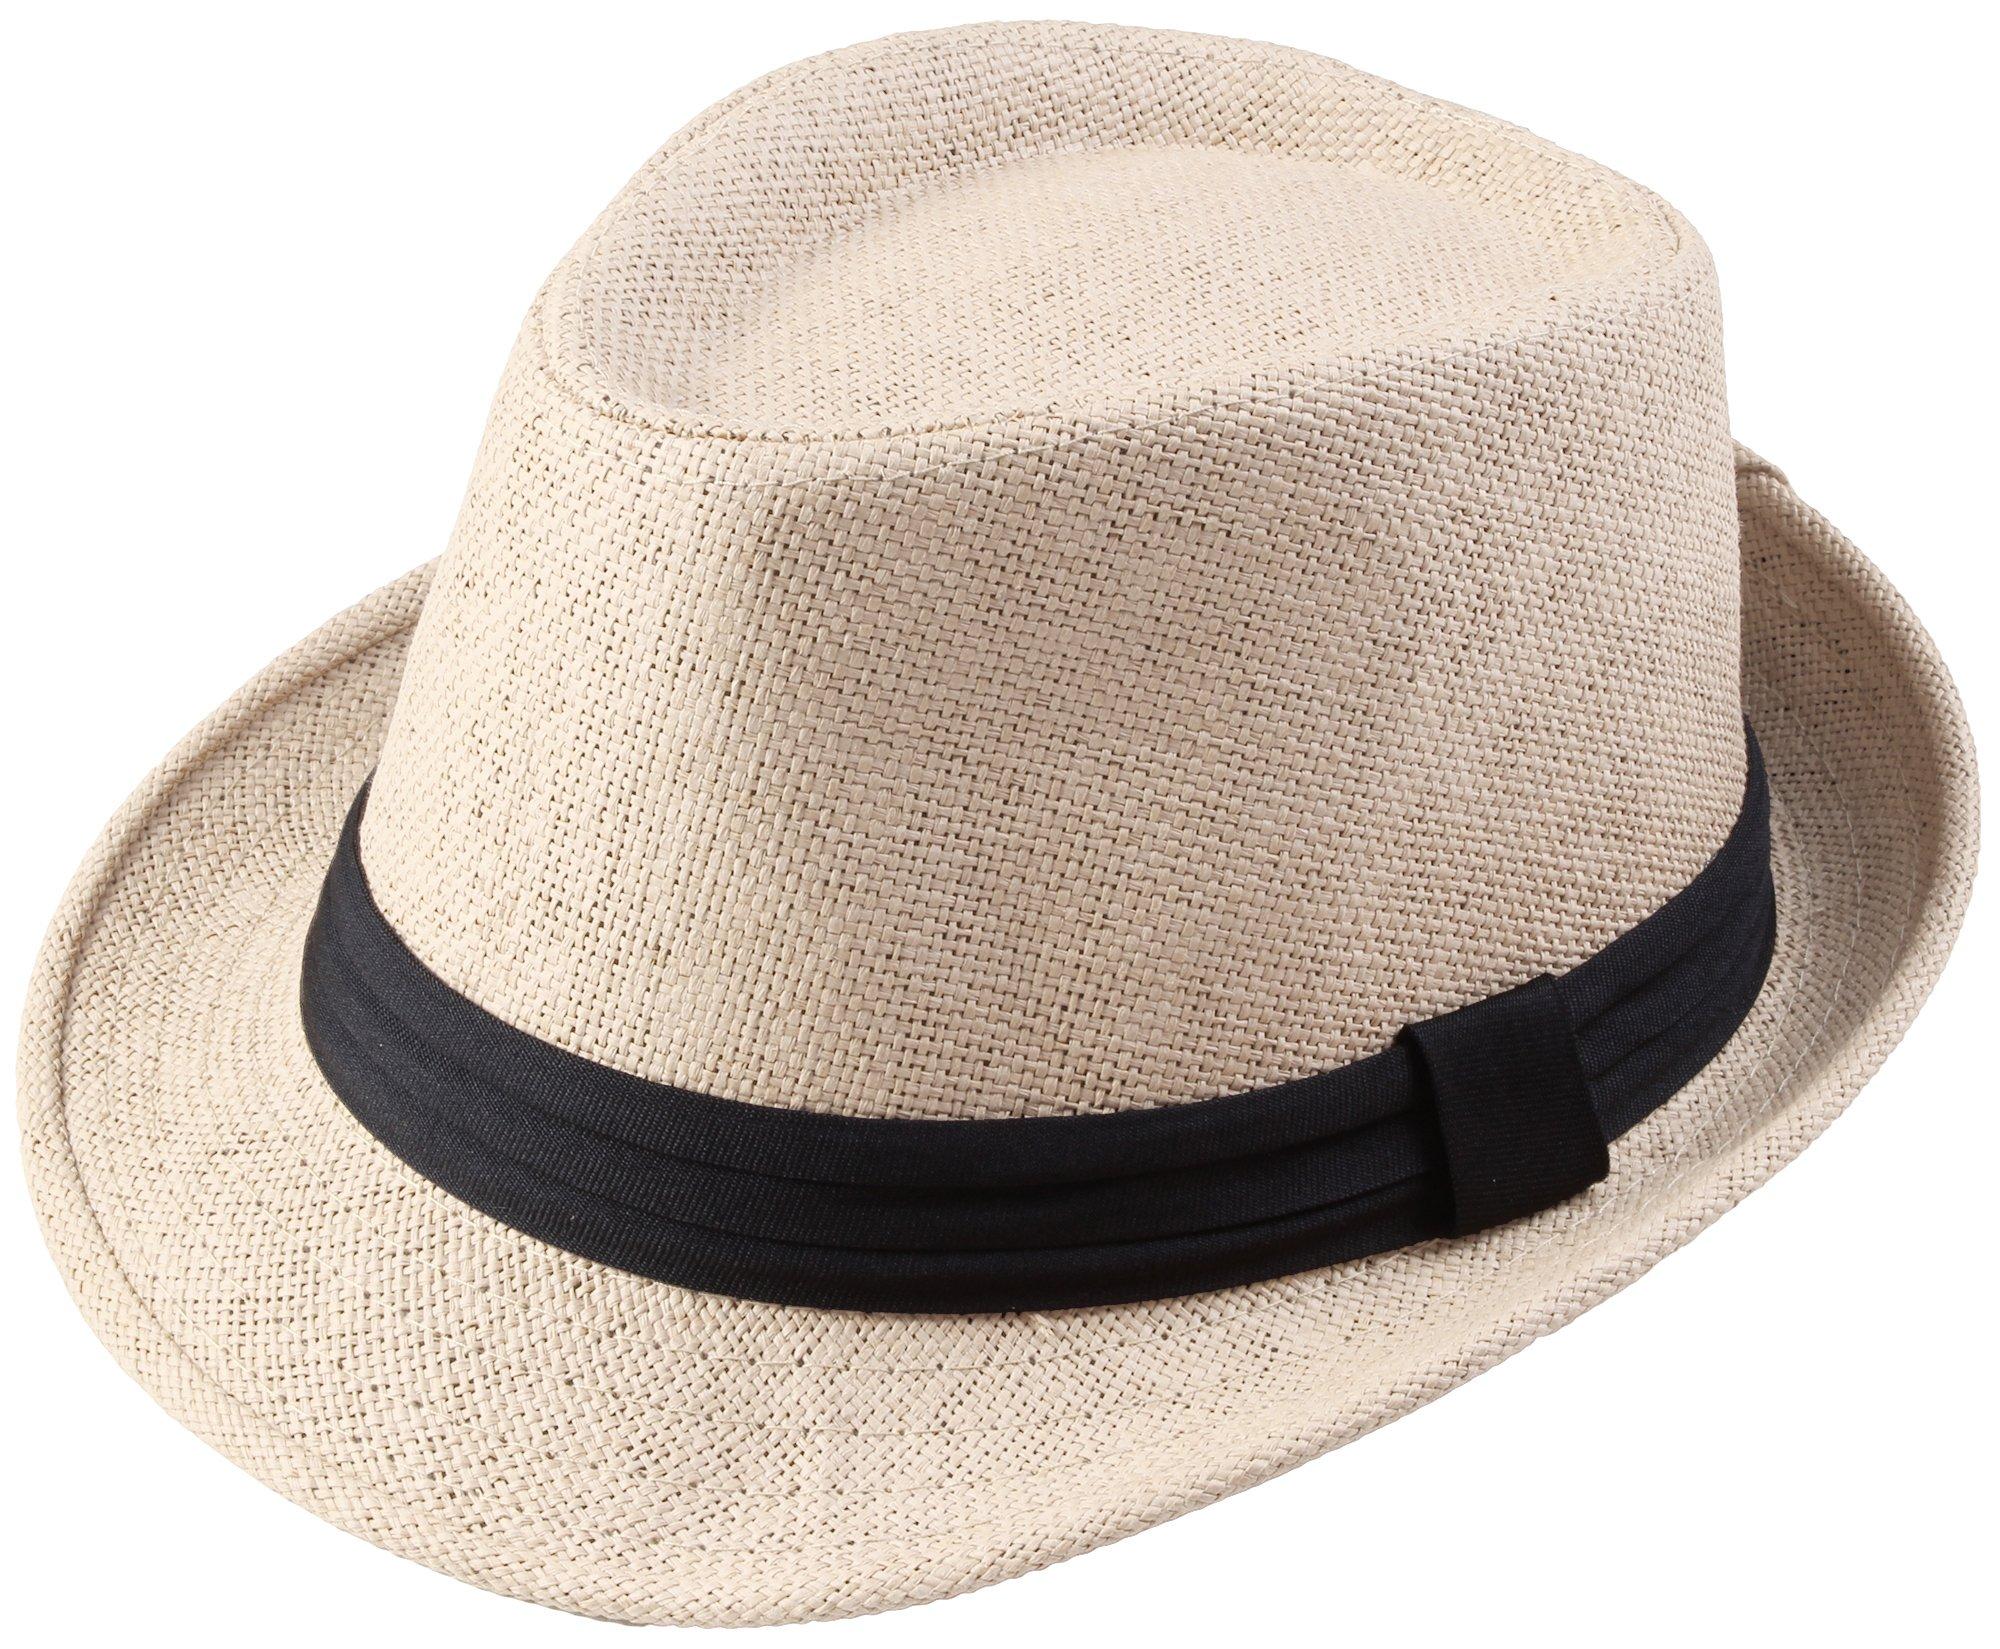 Classic Fedra Unisex Woven Hat Summer w/Stylish Band - D